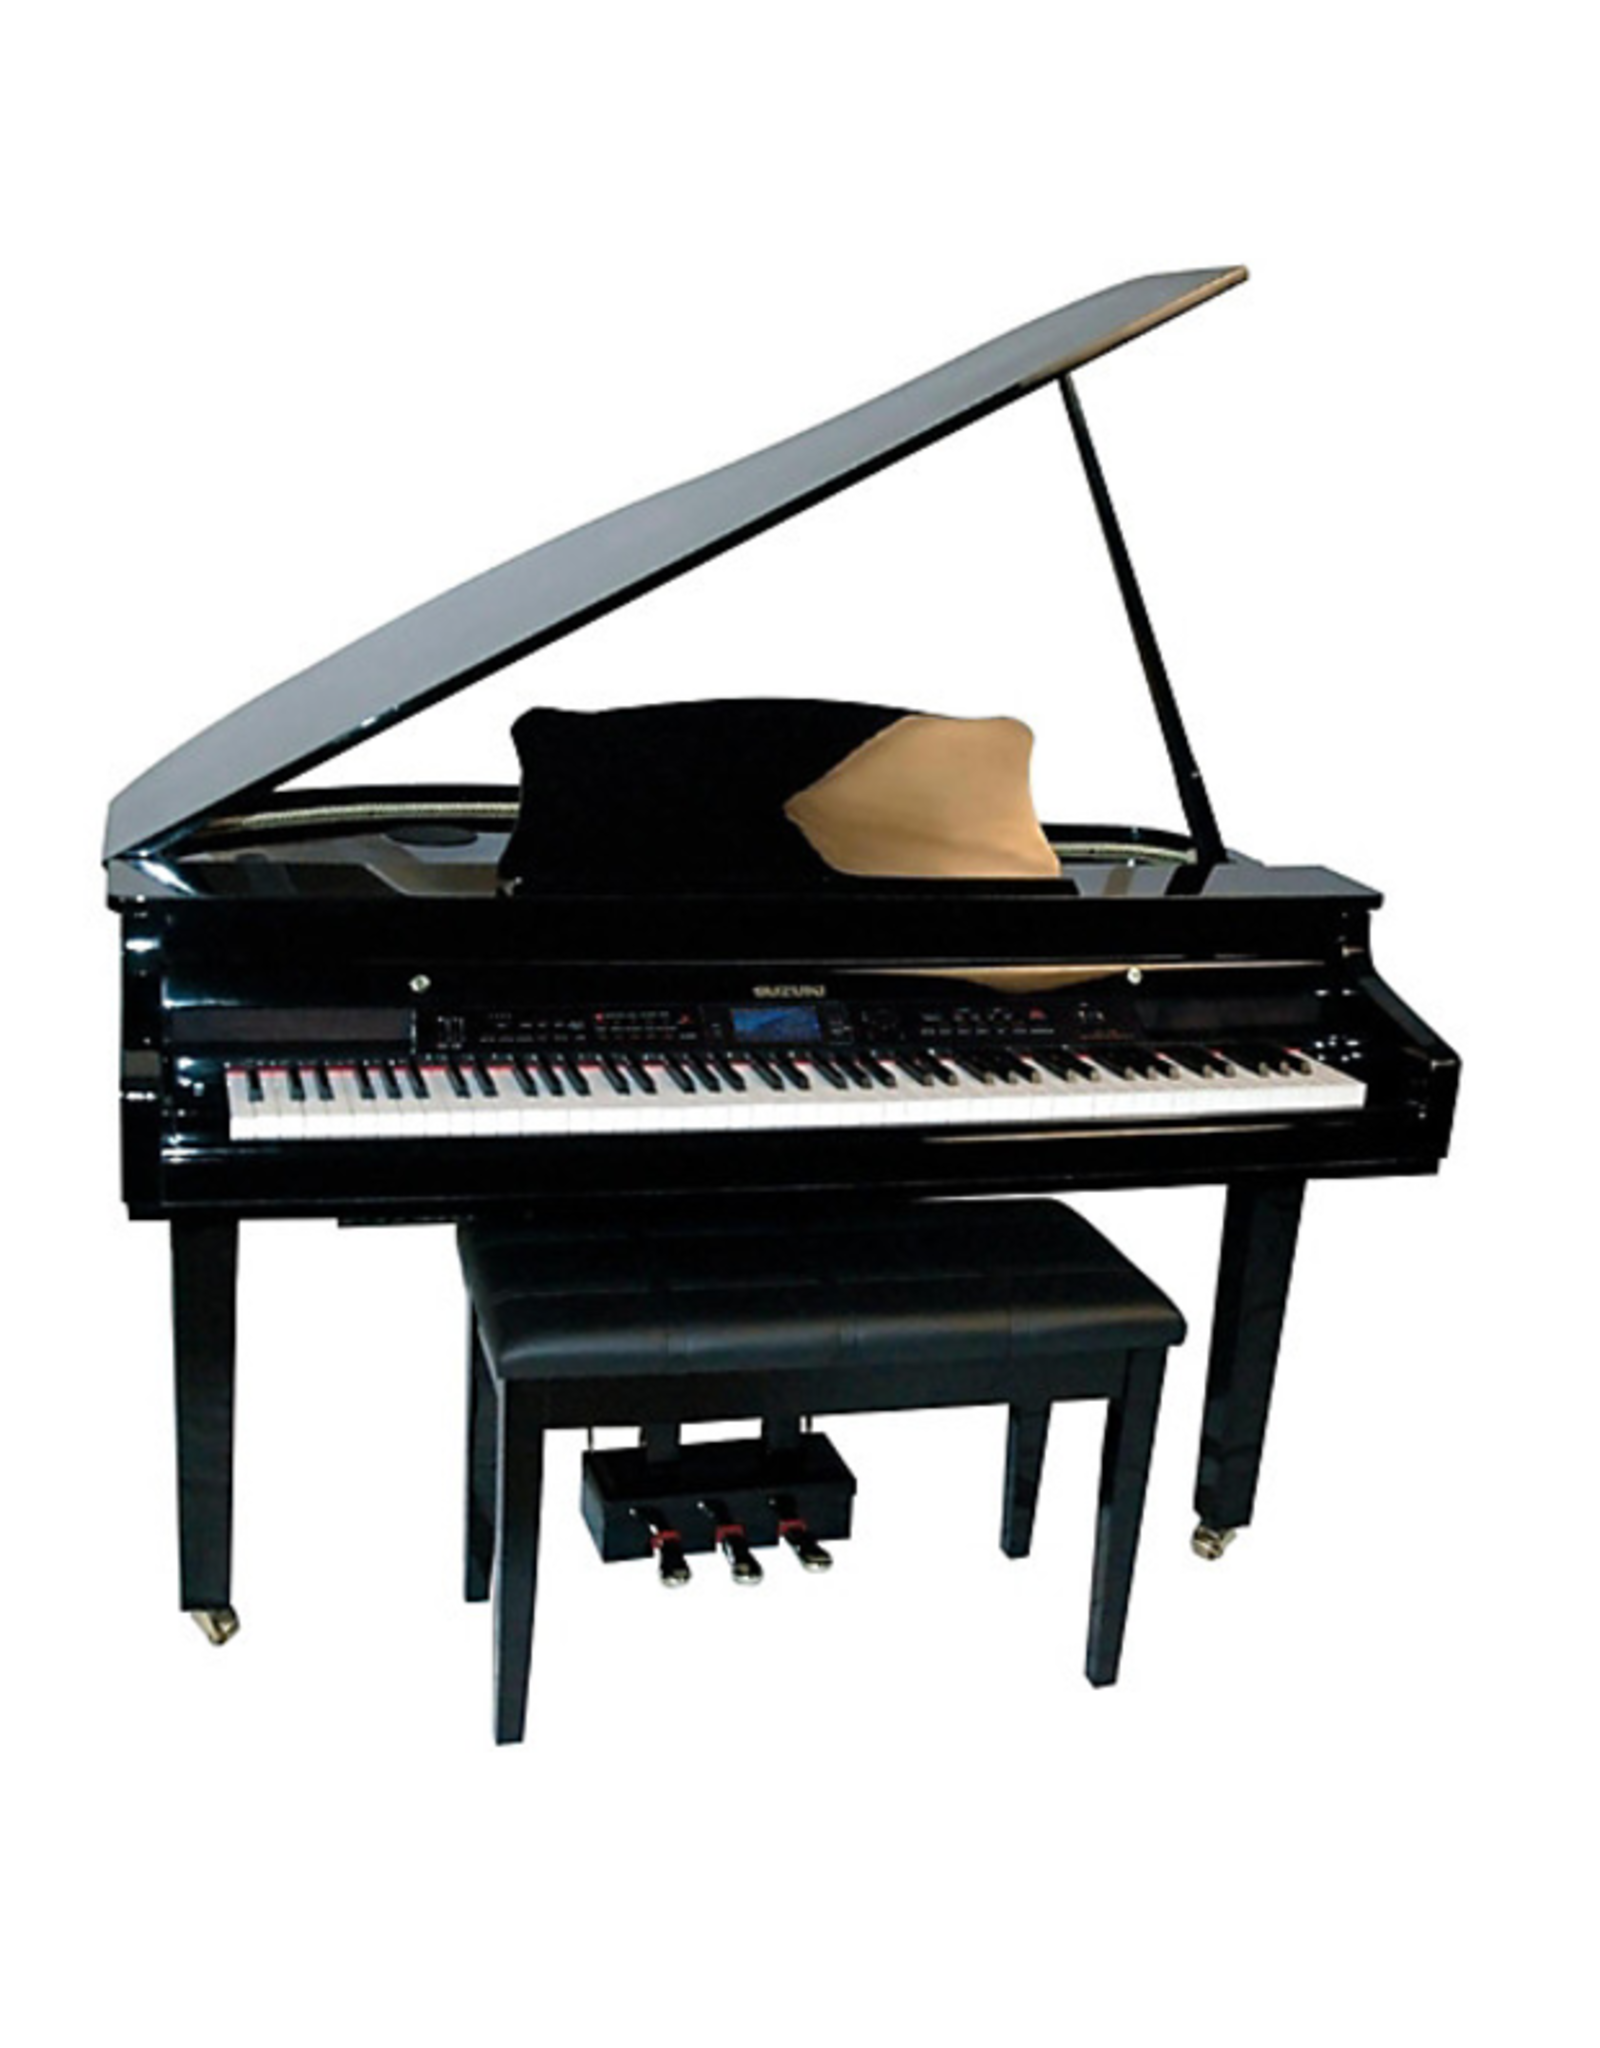 Suzuki Suzuki MDG-330 Mini Grand Digital Piano